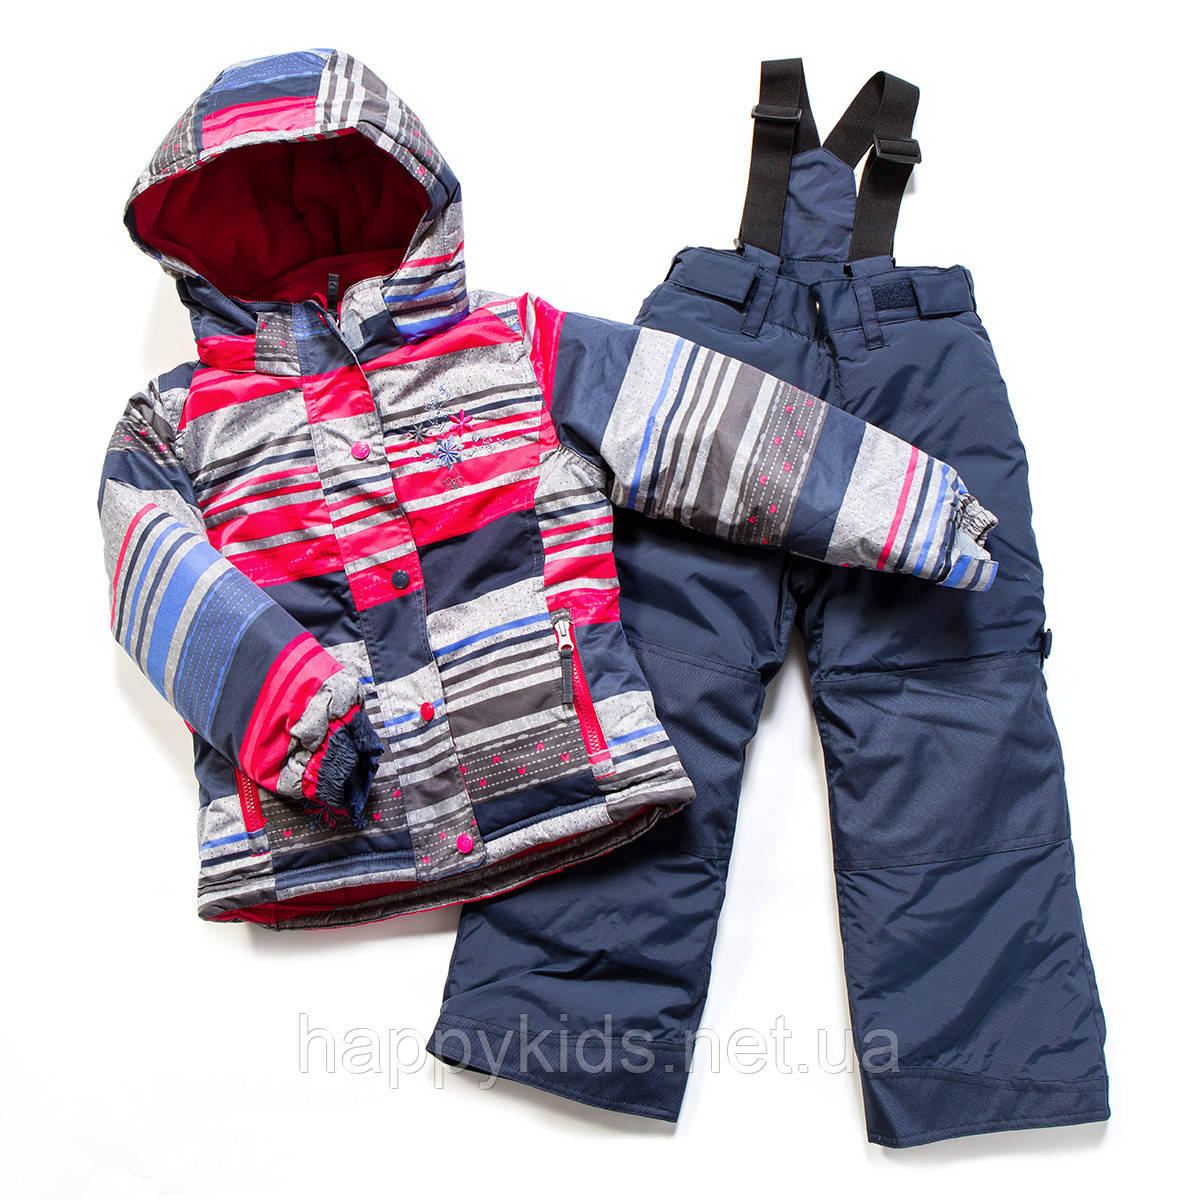 Зимний костюм для девочки PELUCHE F17 M 72 EF Raspberry / Dk Heaven. Размеры 96 - 128.